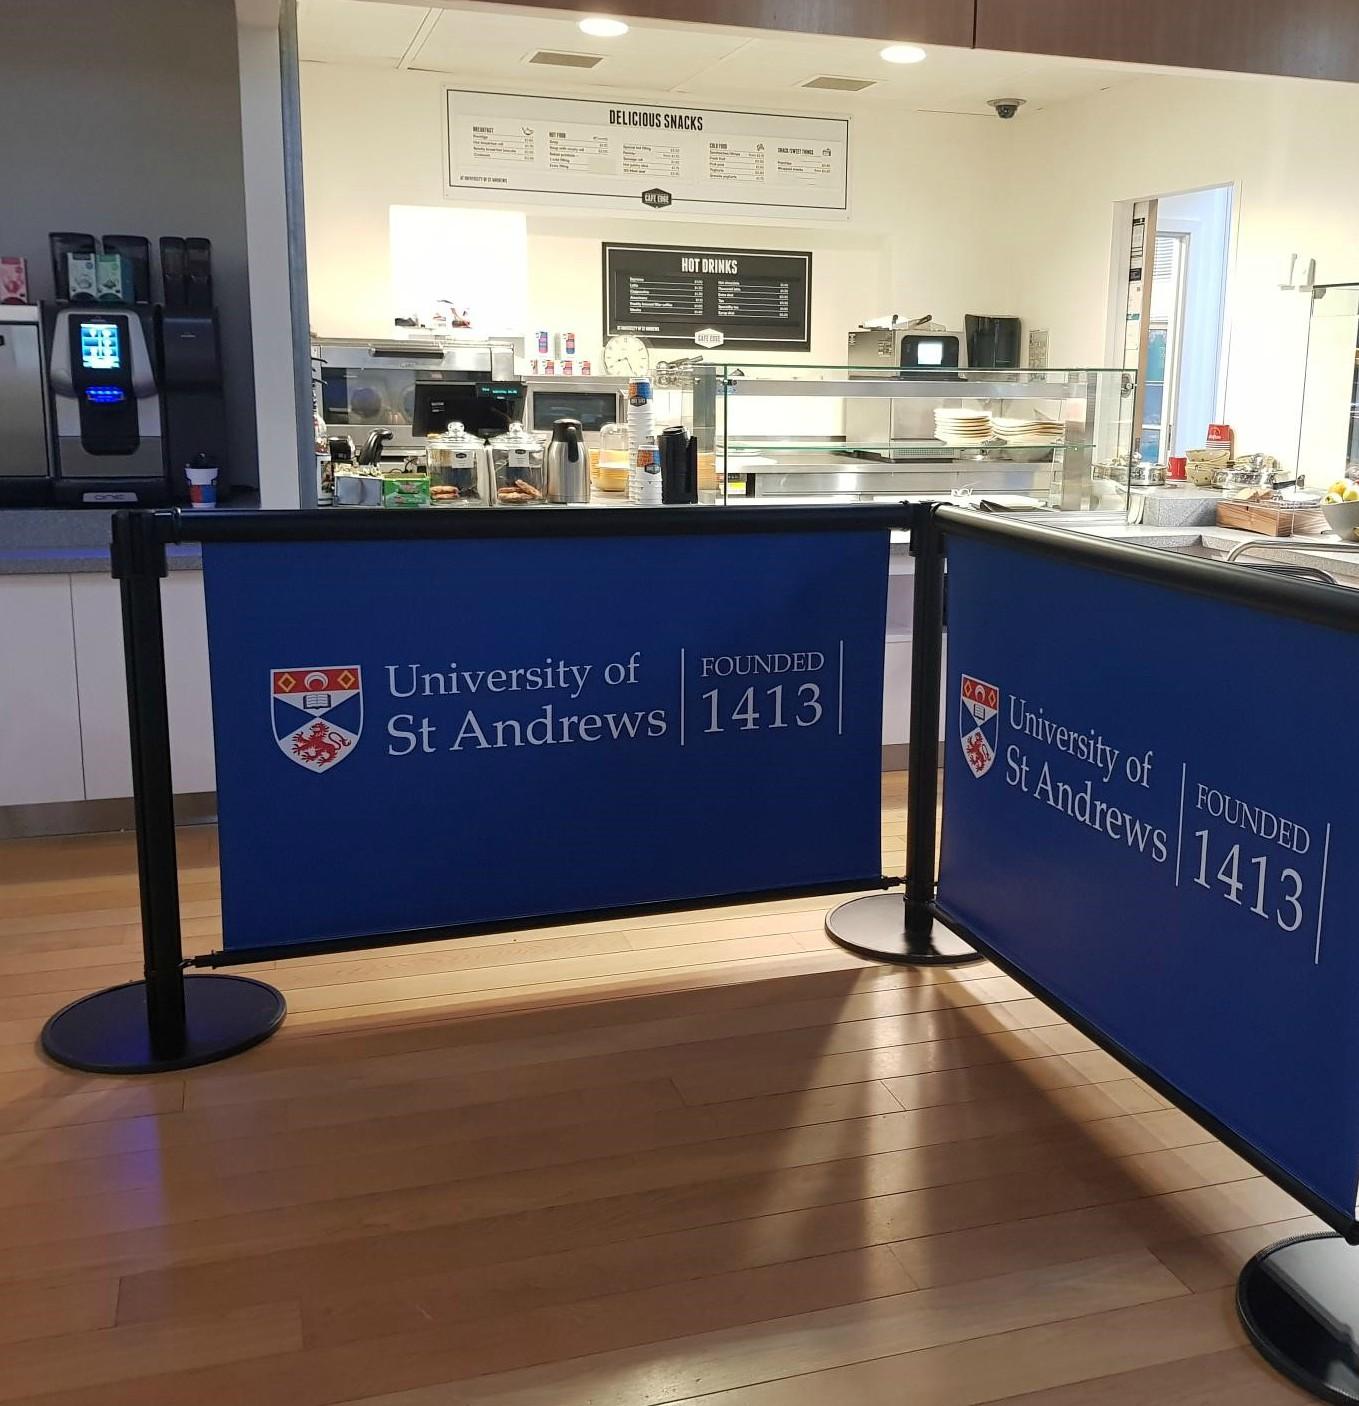 3 University of St Andrews